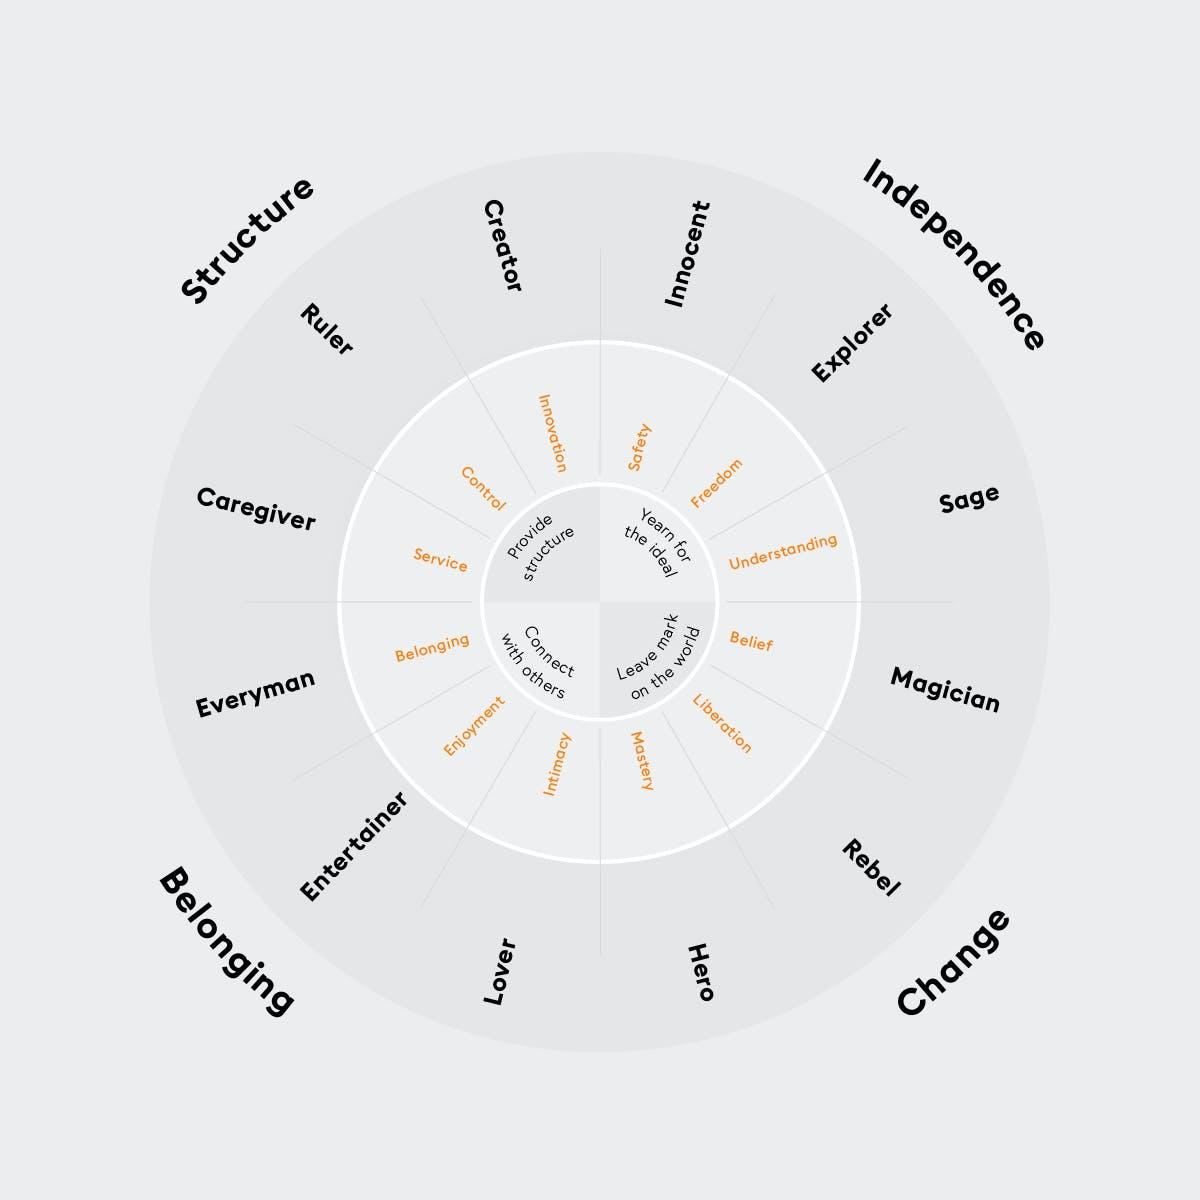 Brand Archetype Wheel